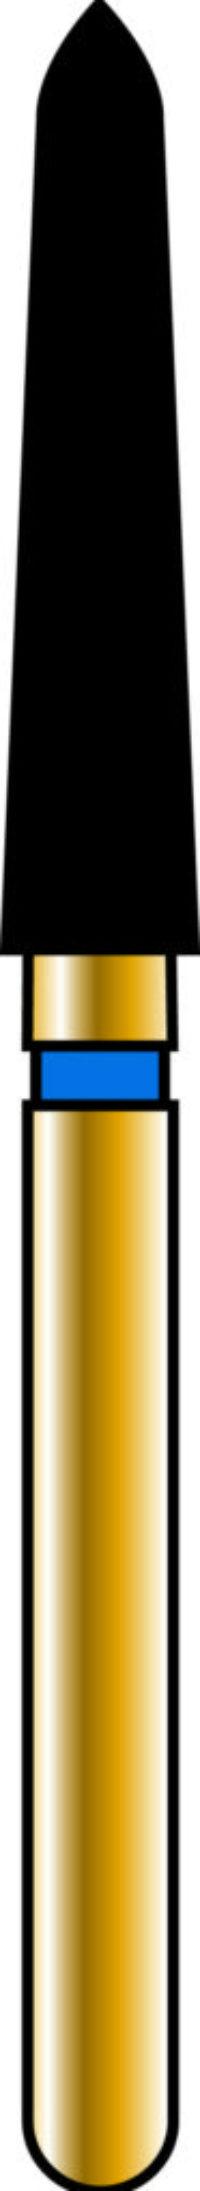 Pointed Taper 21-10mm Gold Diamond Bur